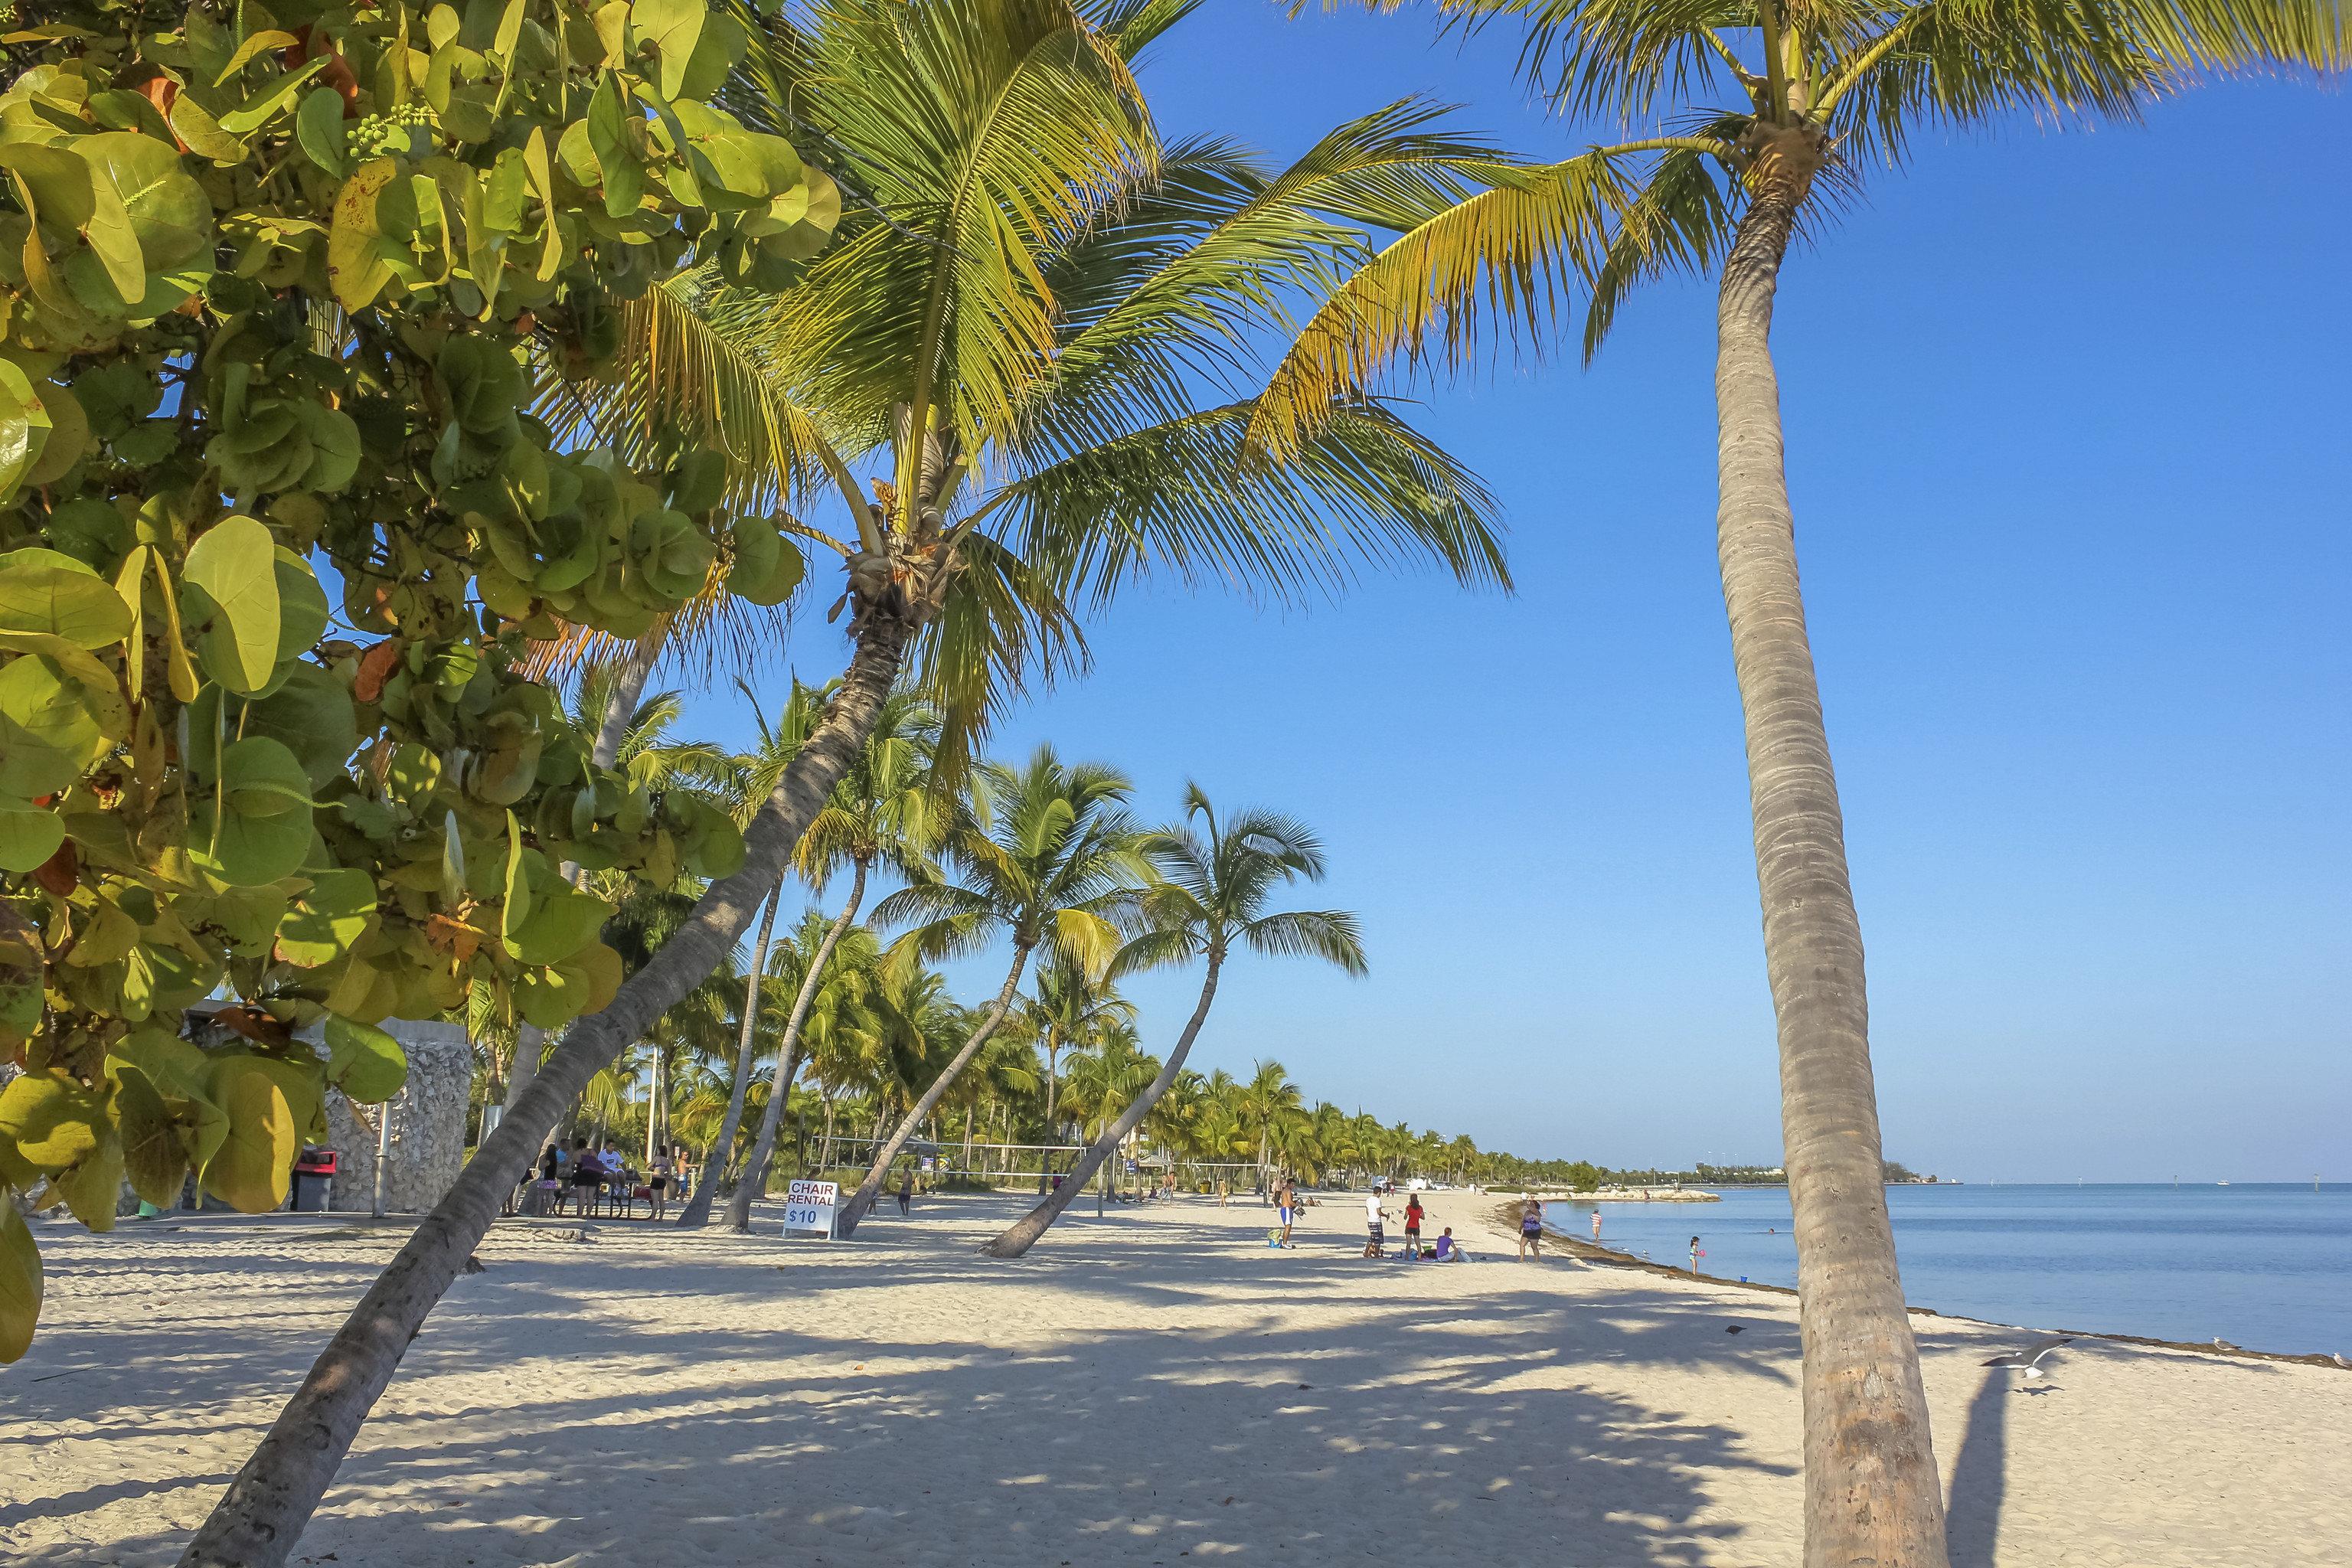 Trip Ideas outdoor tree sky Beach palm plant palm family arecales woody plant vacation Coast Sea tropics walkway shore